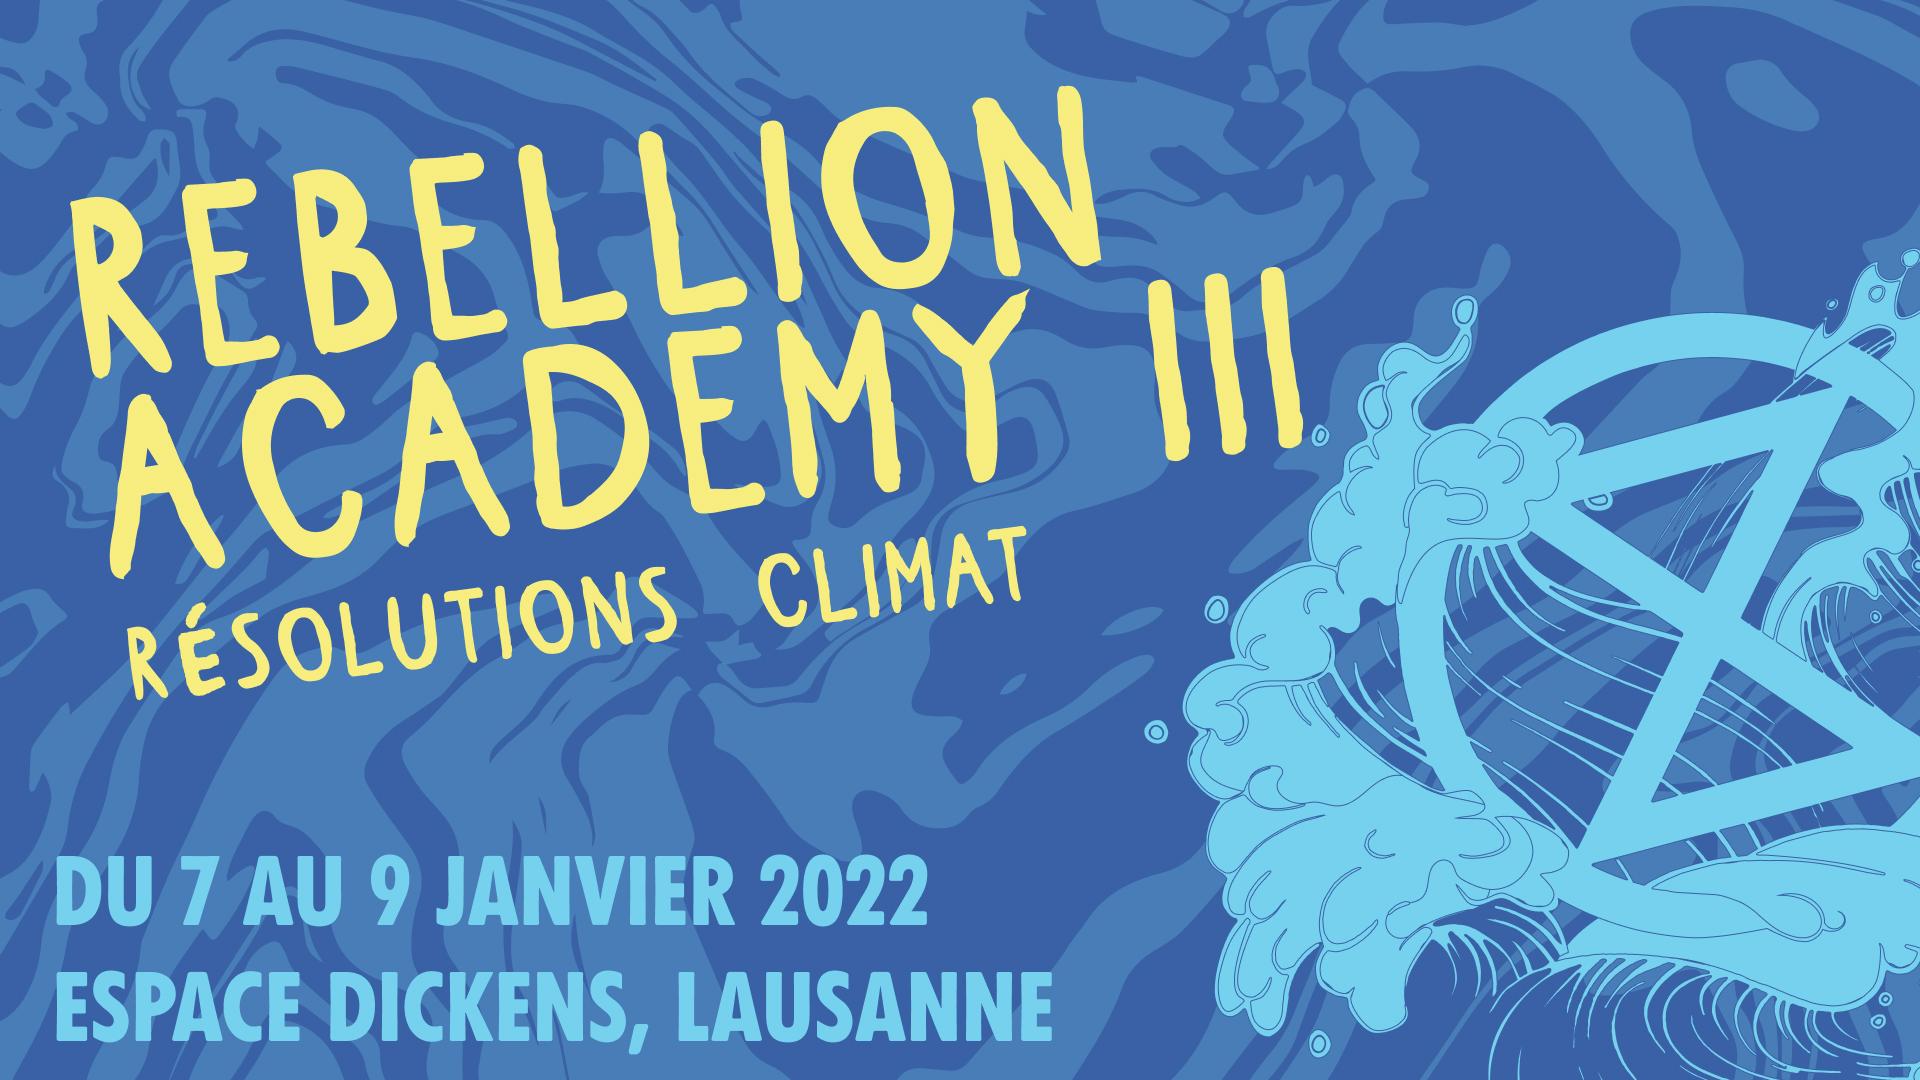 Rébellion Academy III – du 7 au 9 janvier 2022